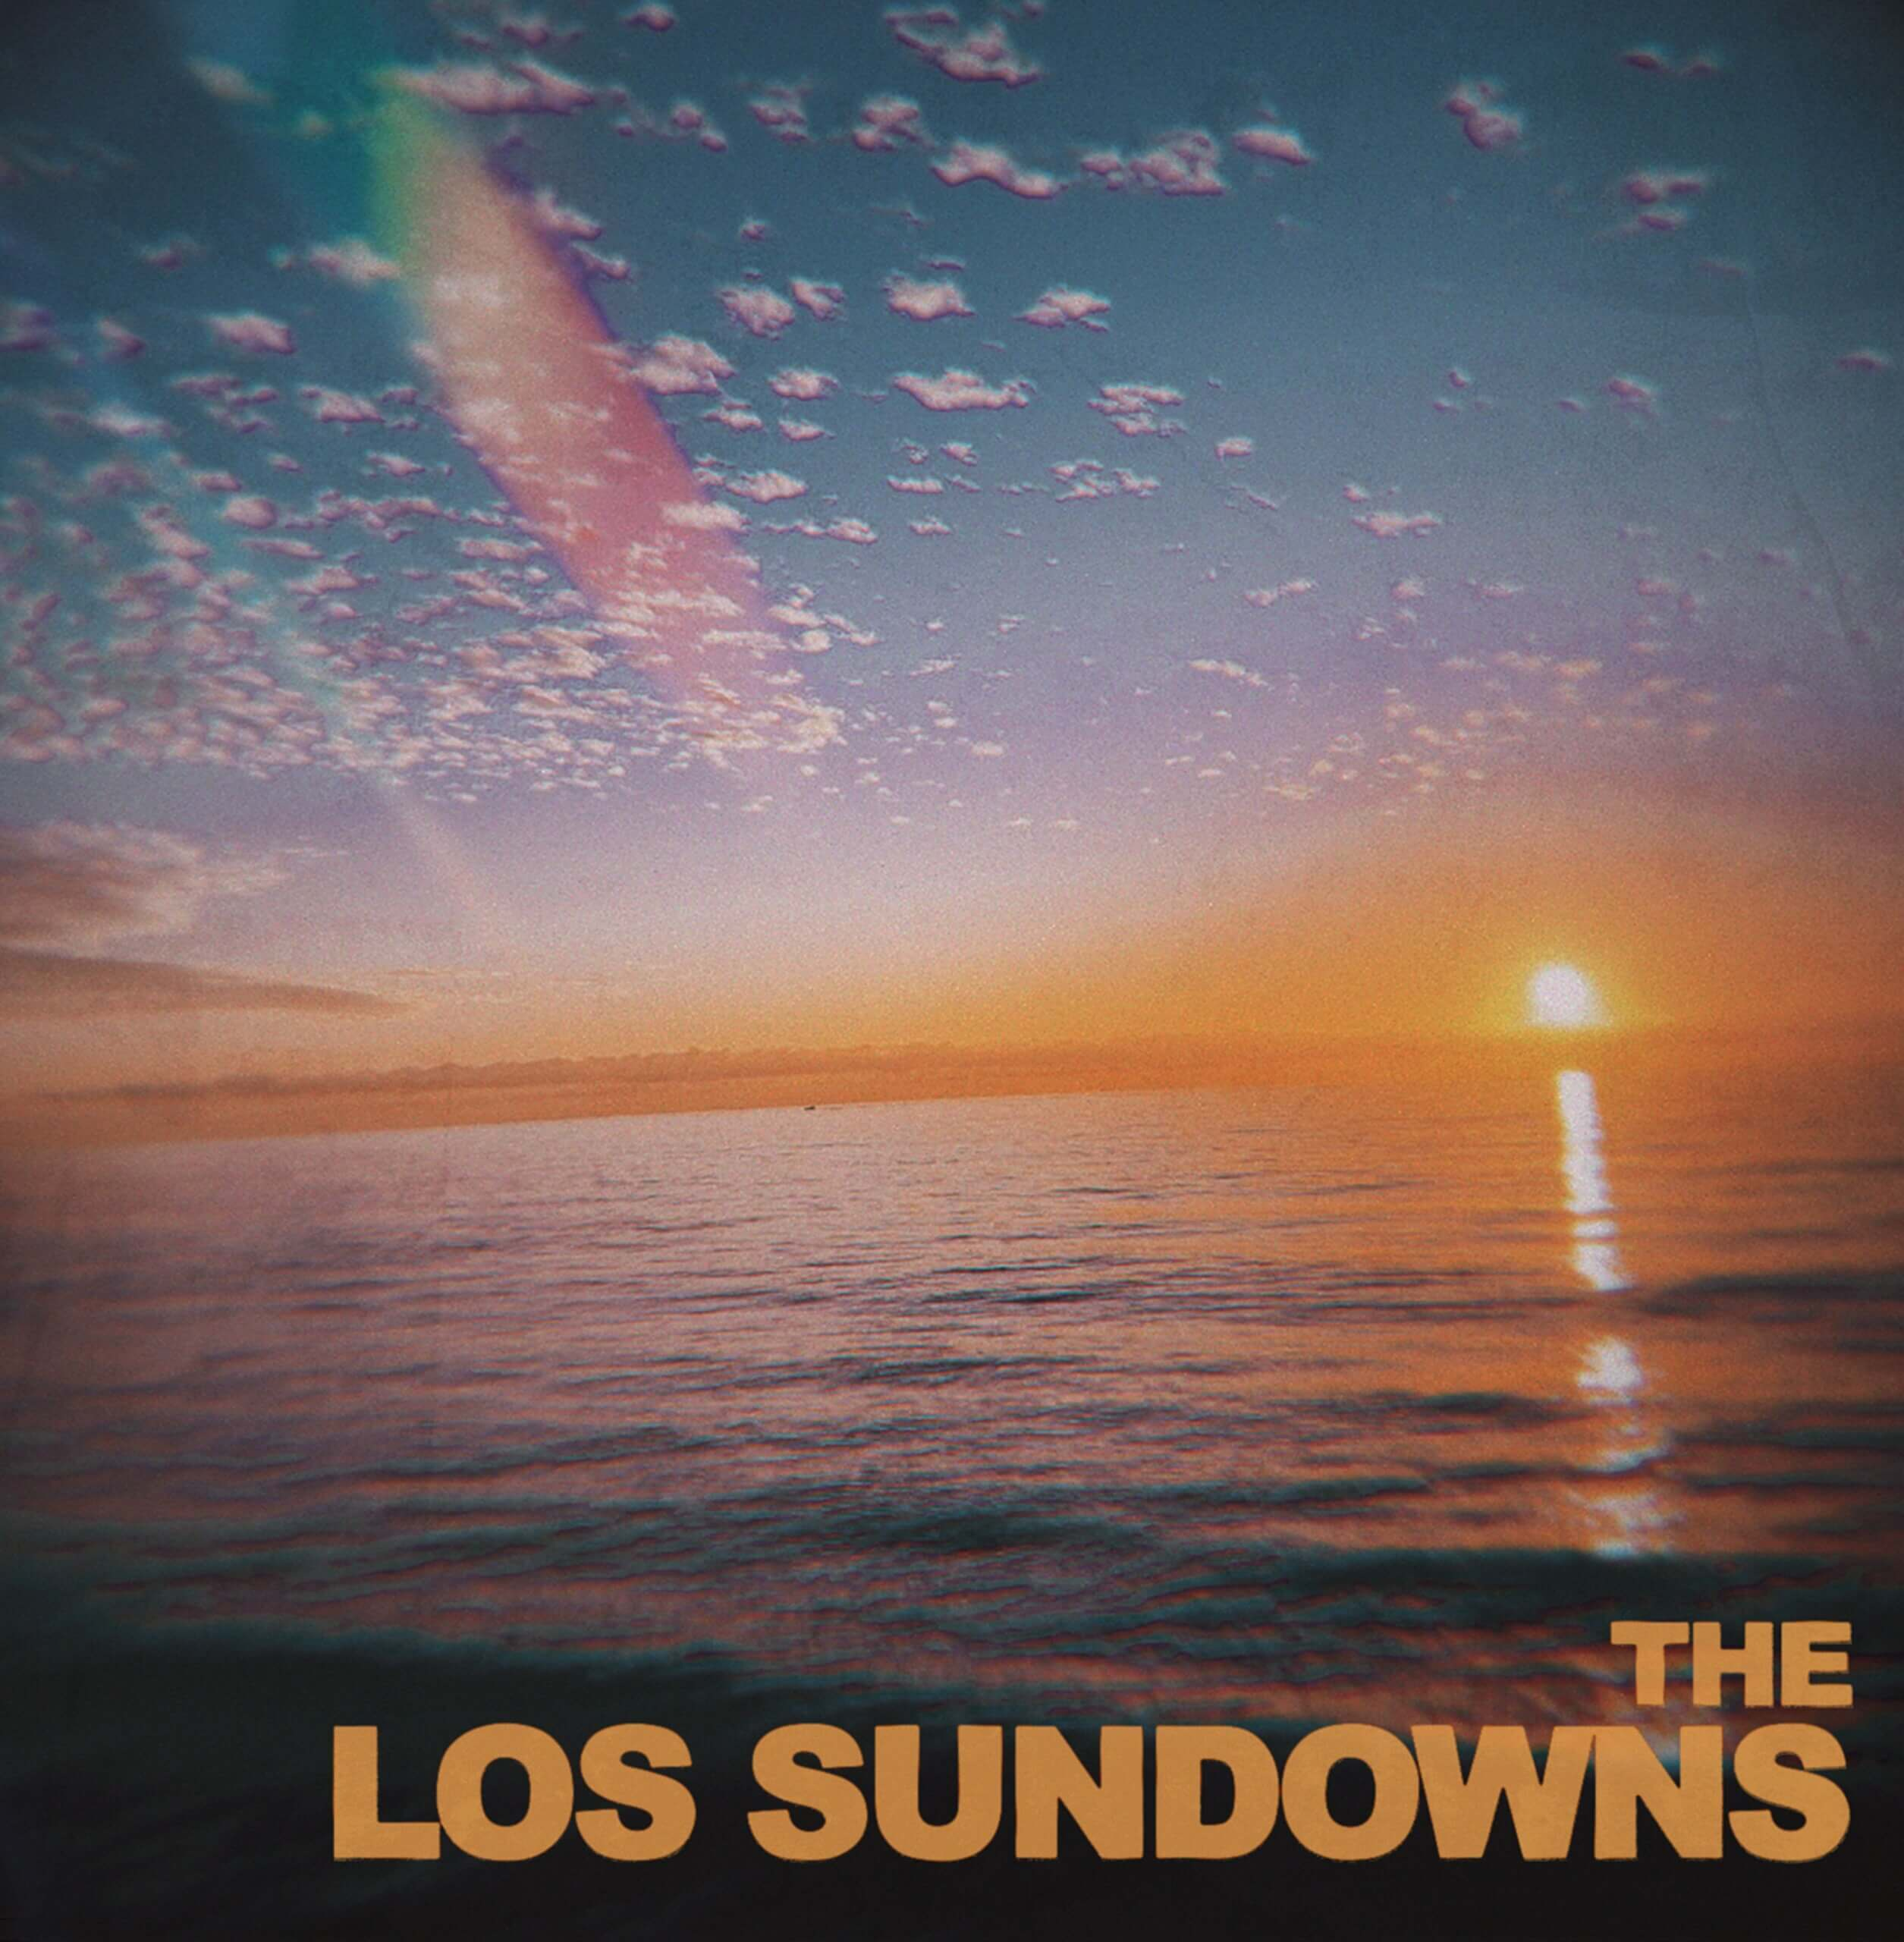 The Los Sundowns